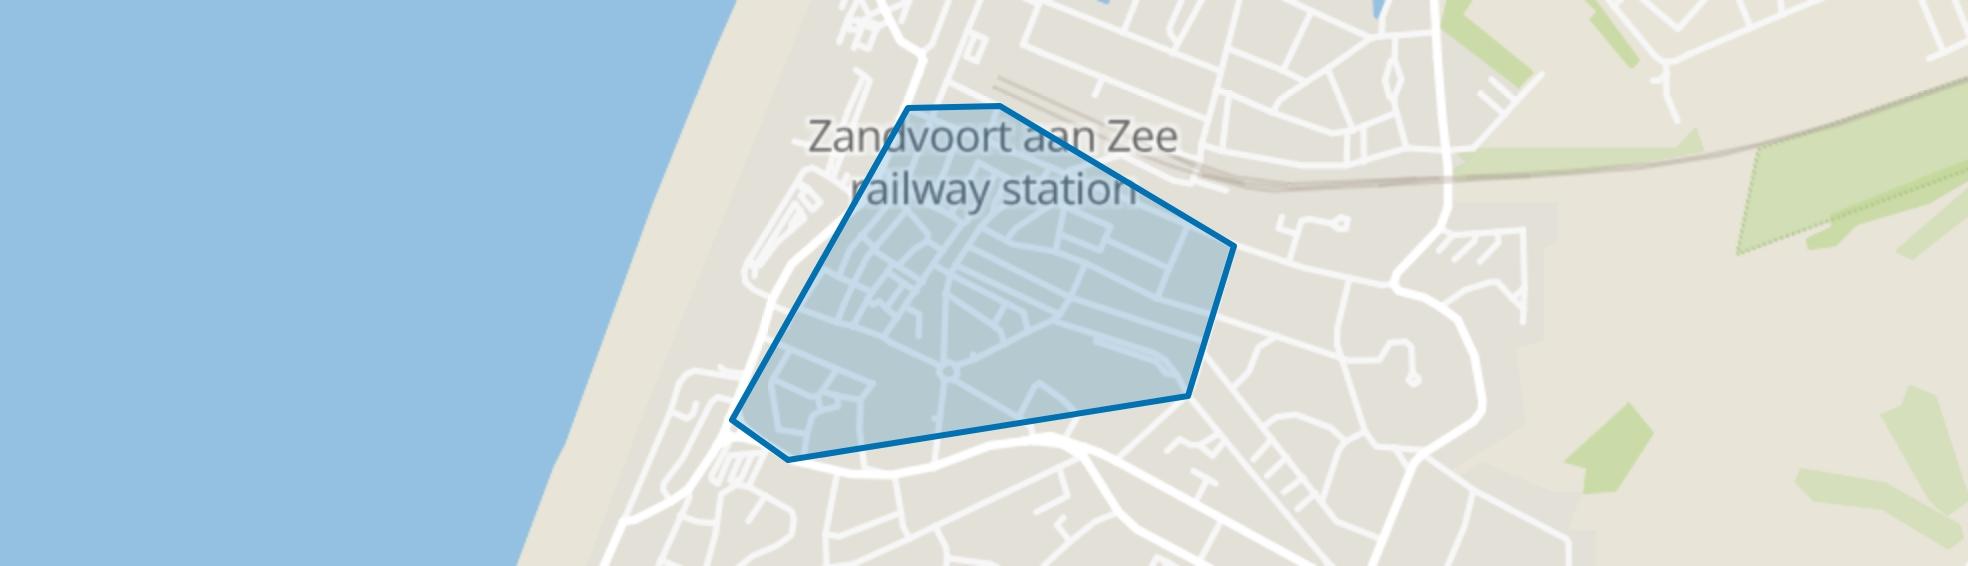 Centrum, Zandvoort map